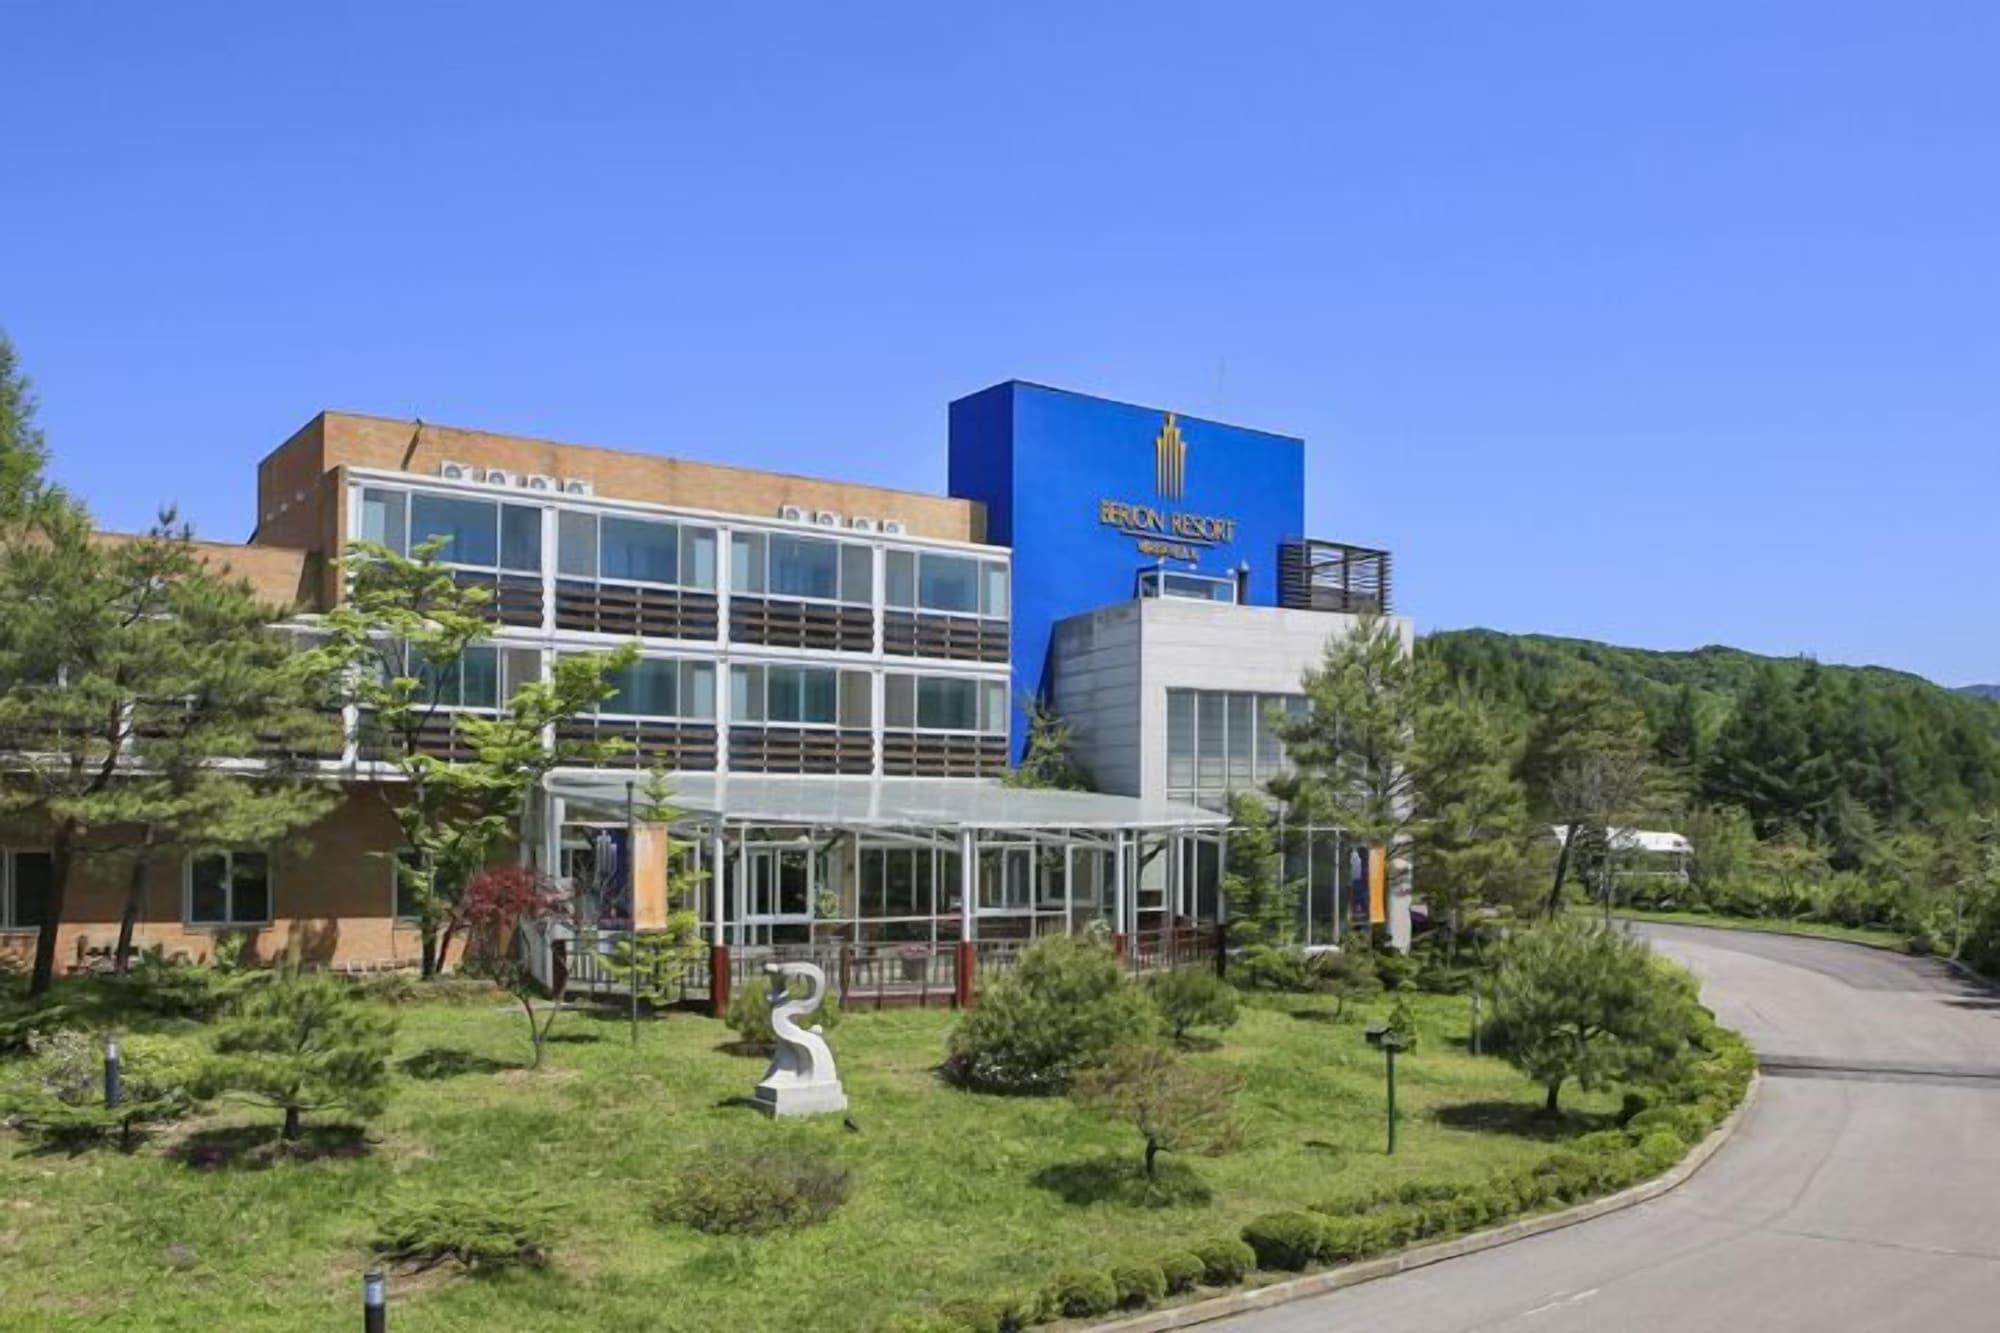 Berion Resort, Pyeongchang